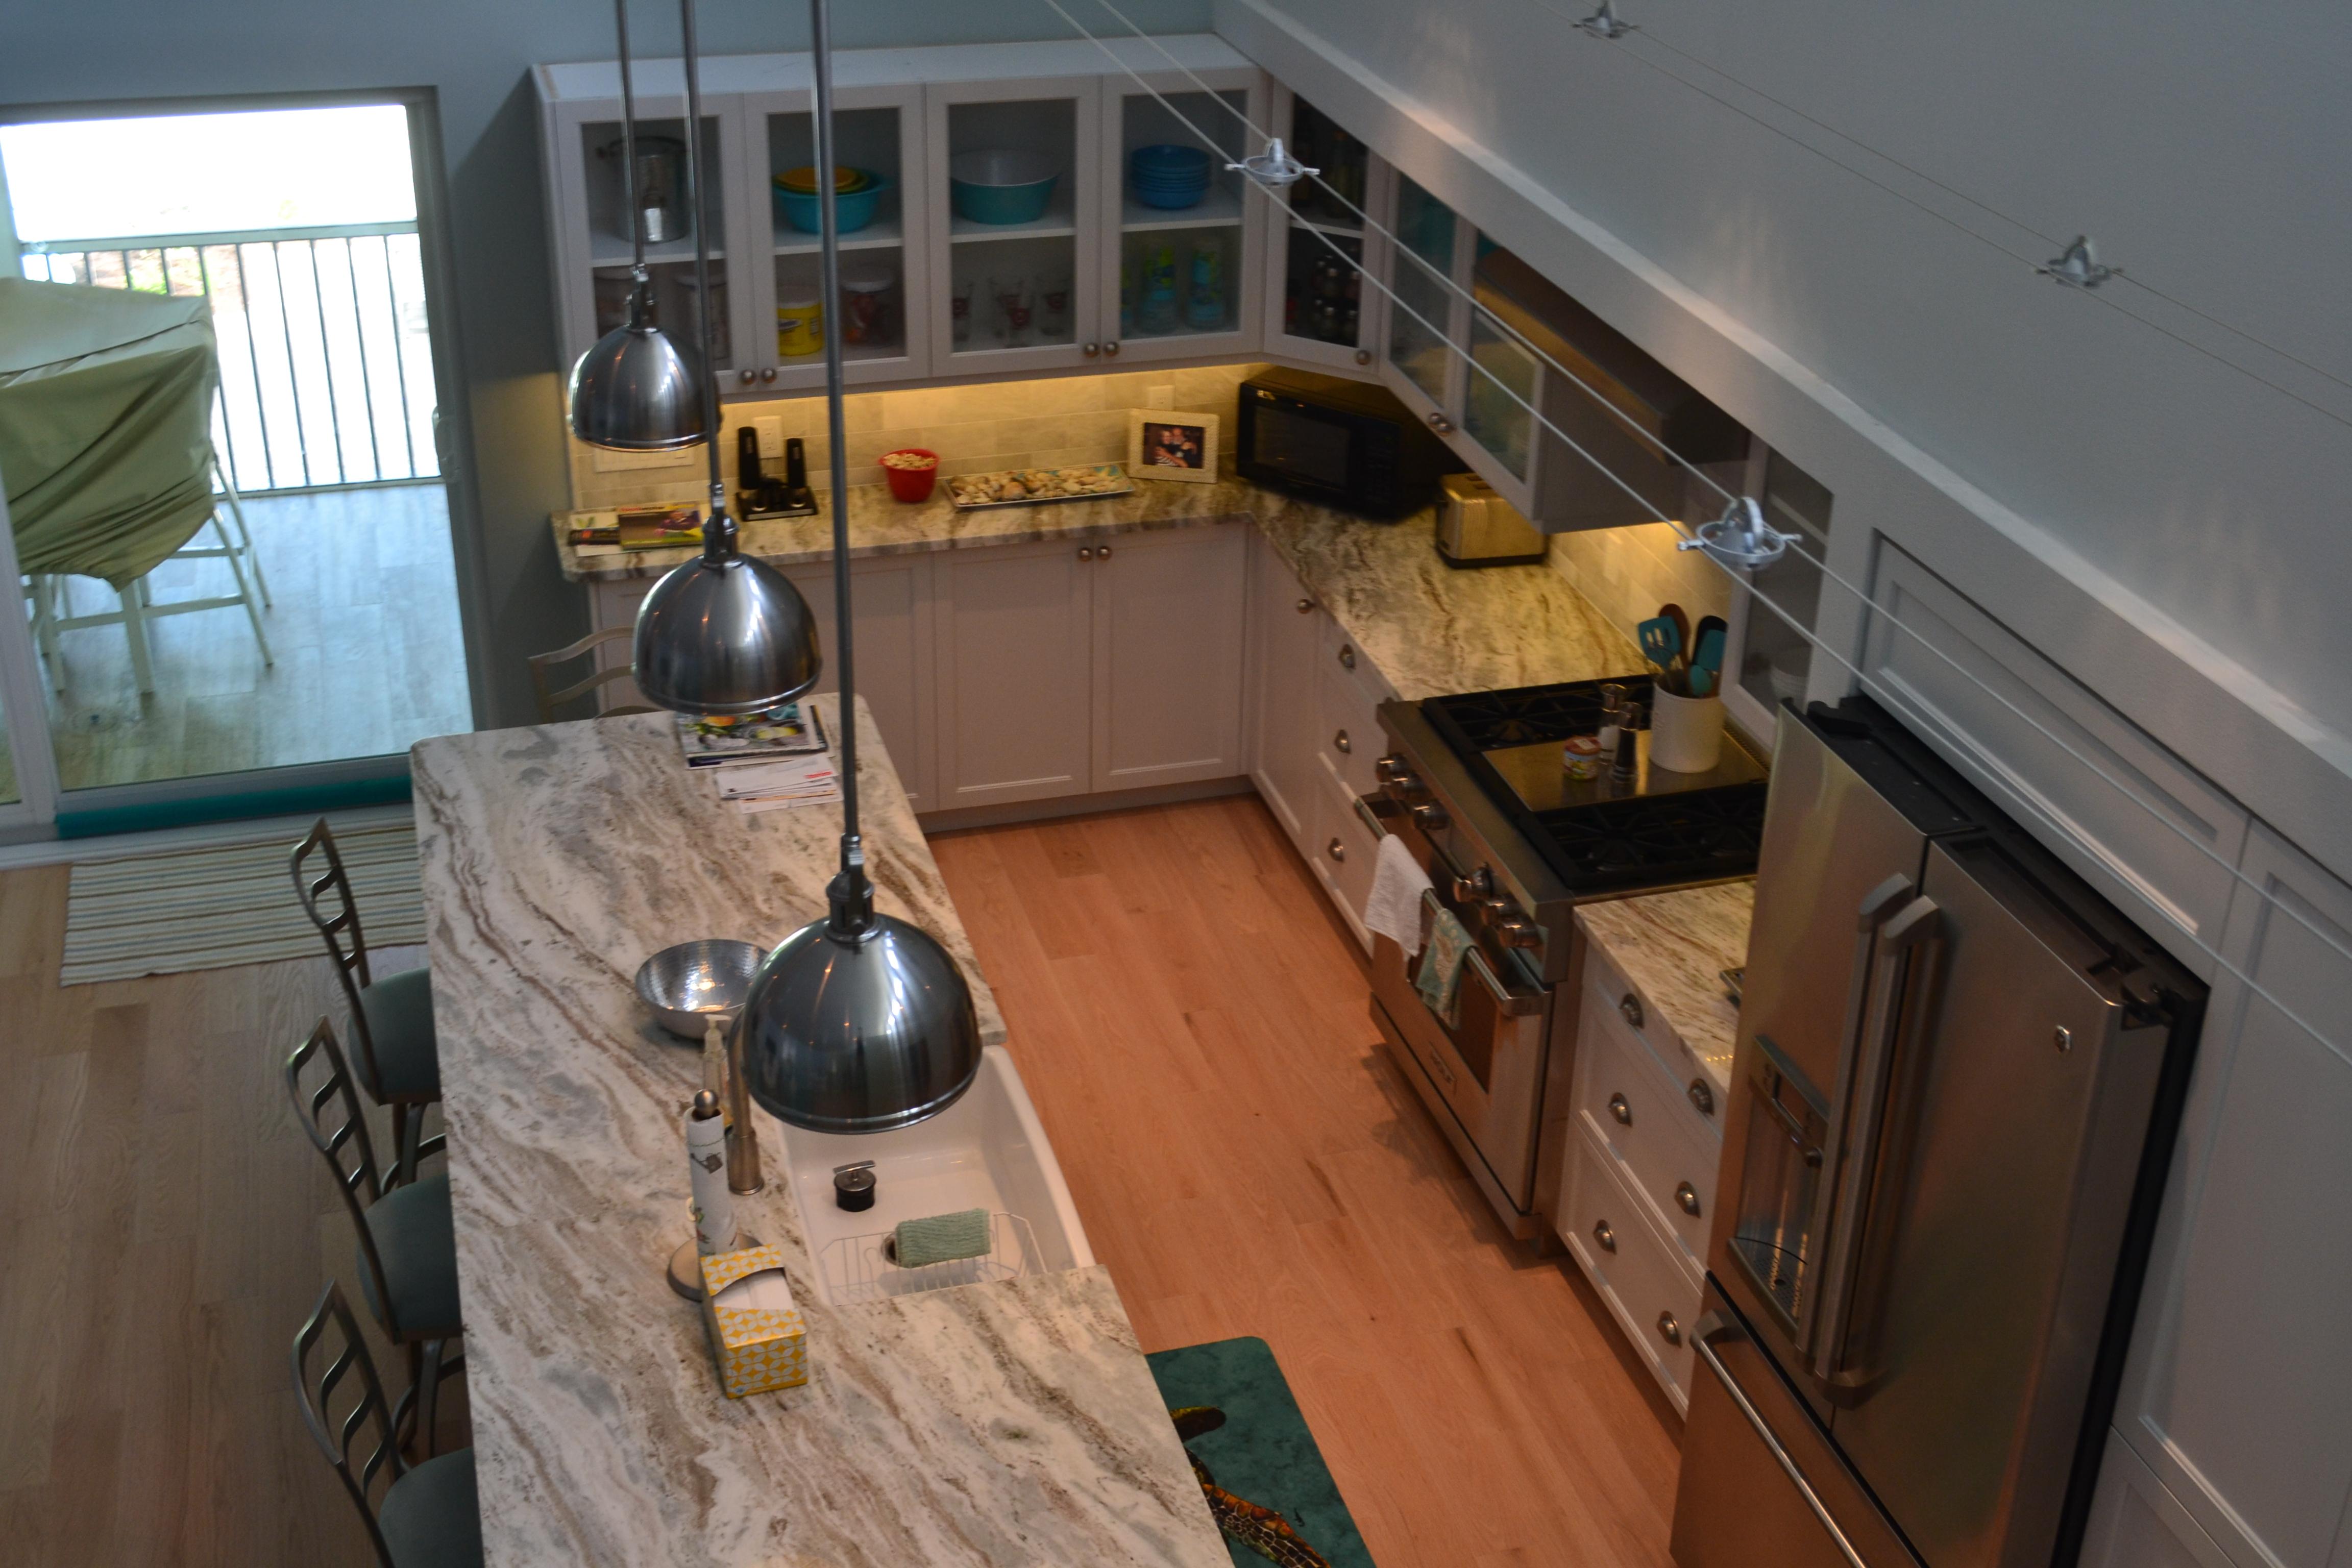 Leibentritt kitchen (5)